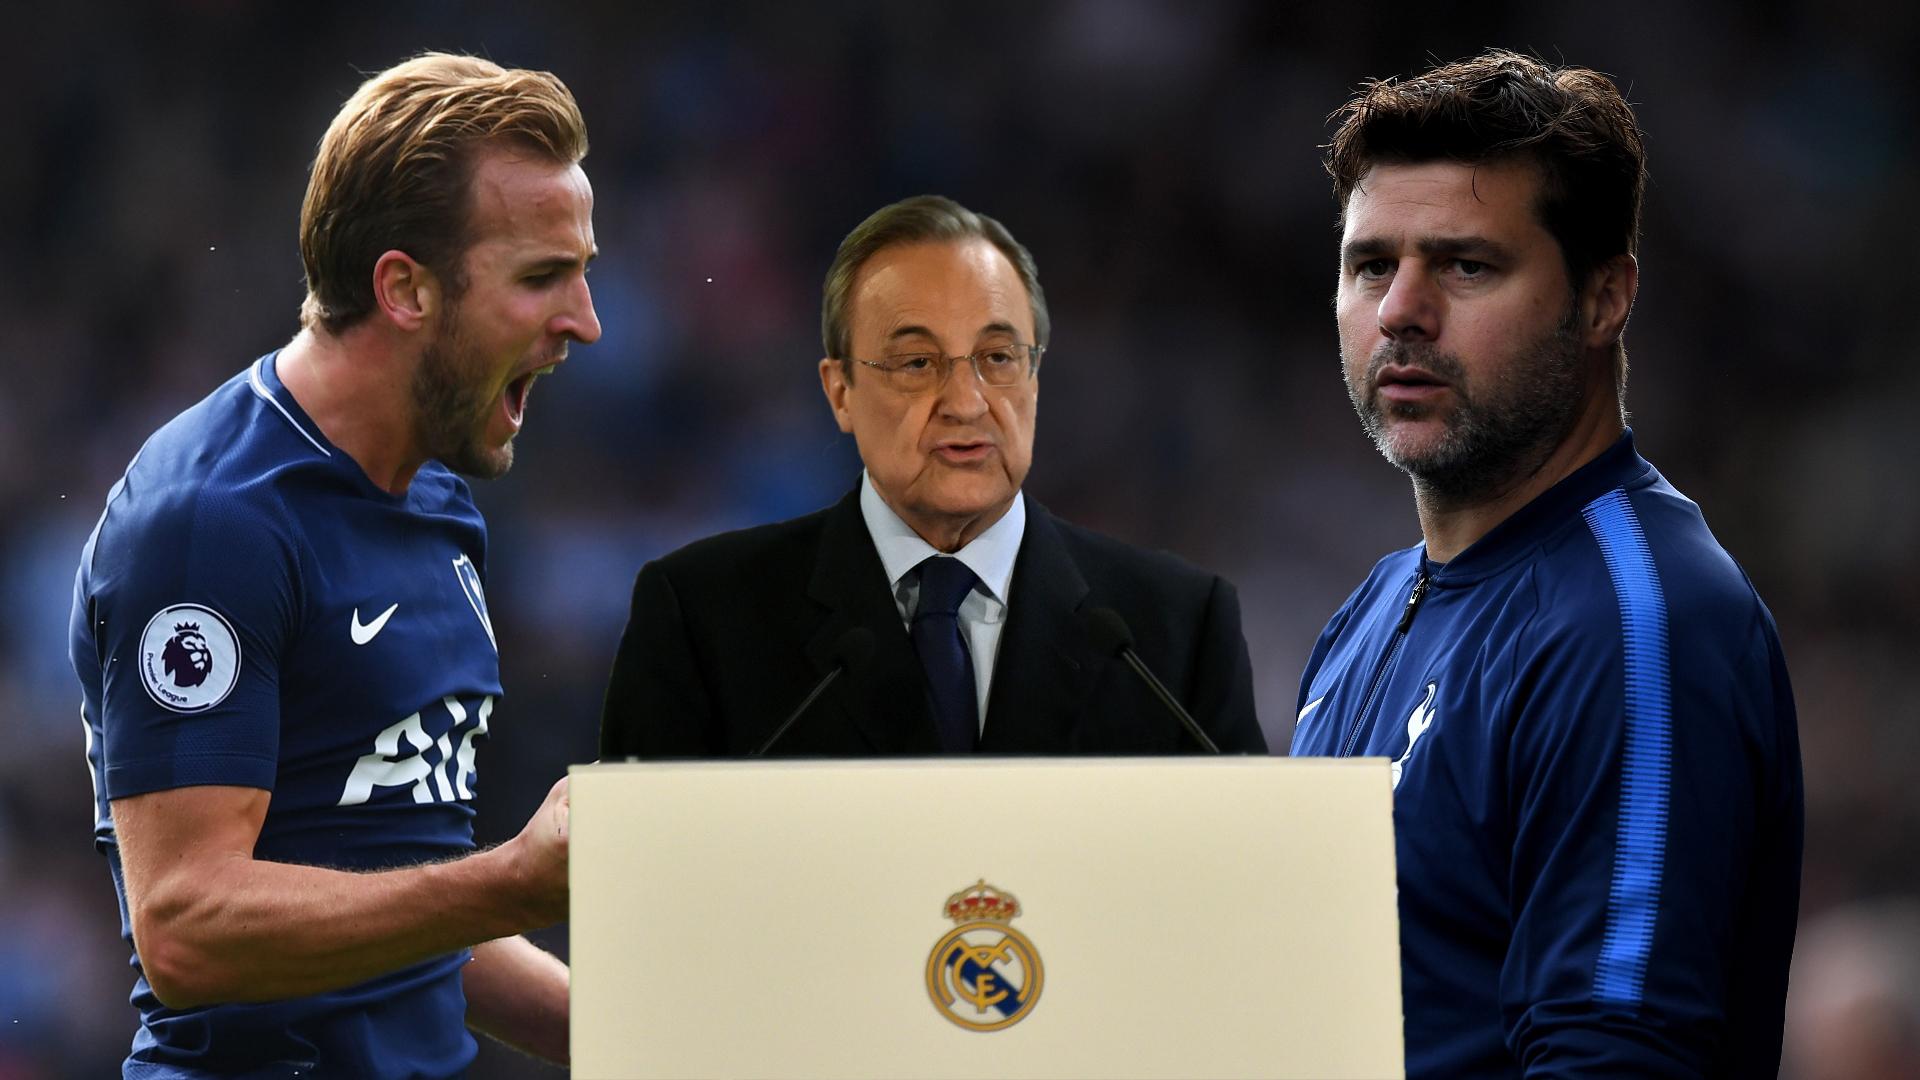 Harry Kane, Mauricio Pochettino, Florentino Perez split